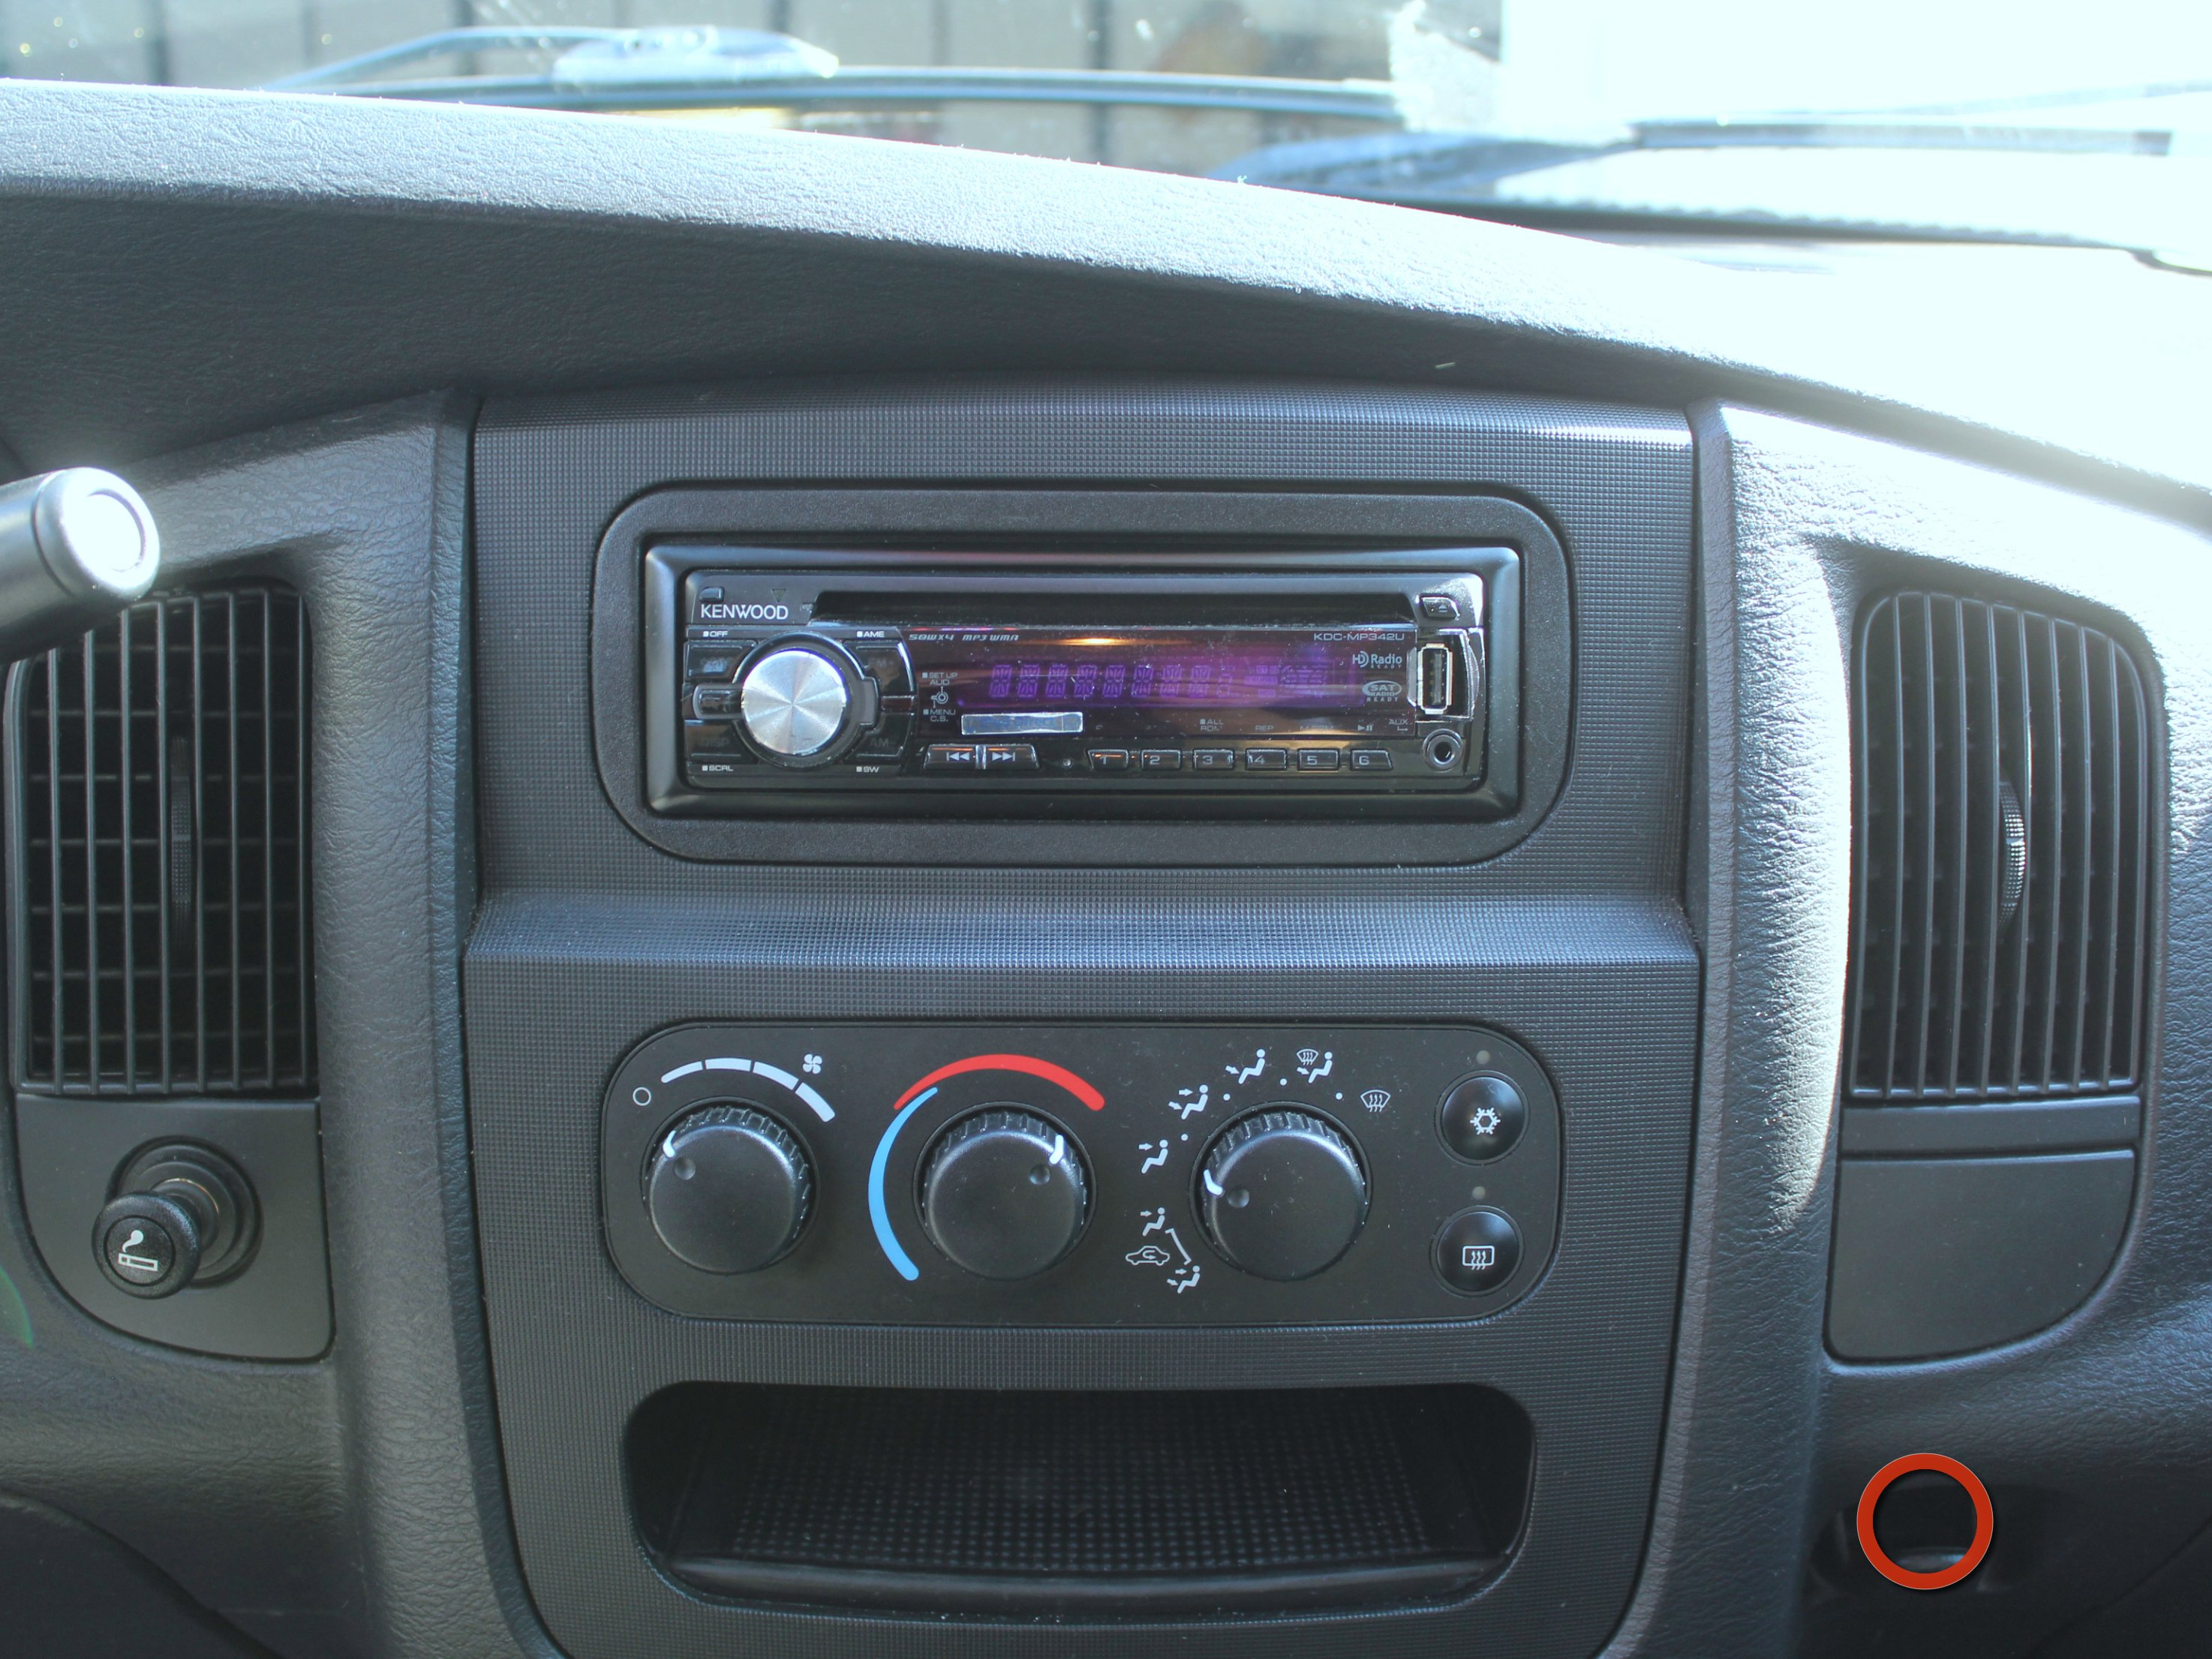 2008 dodge ram radio options